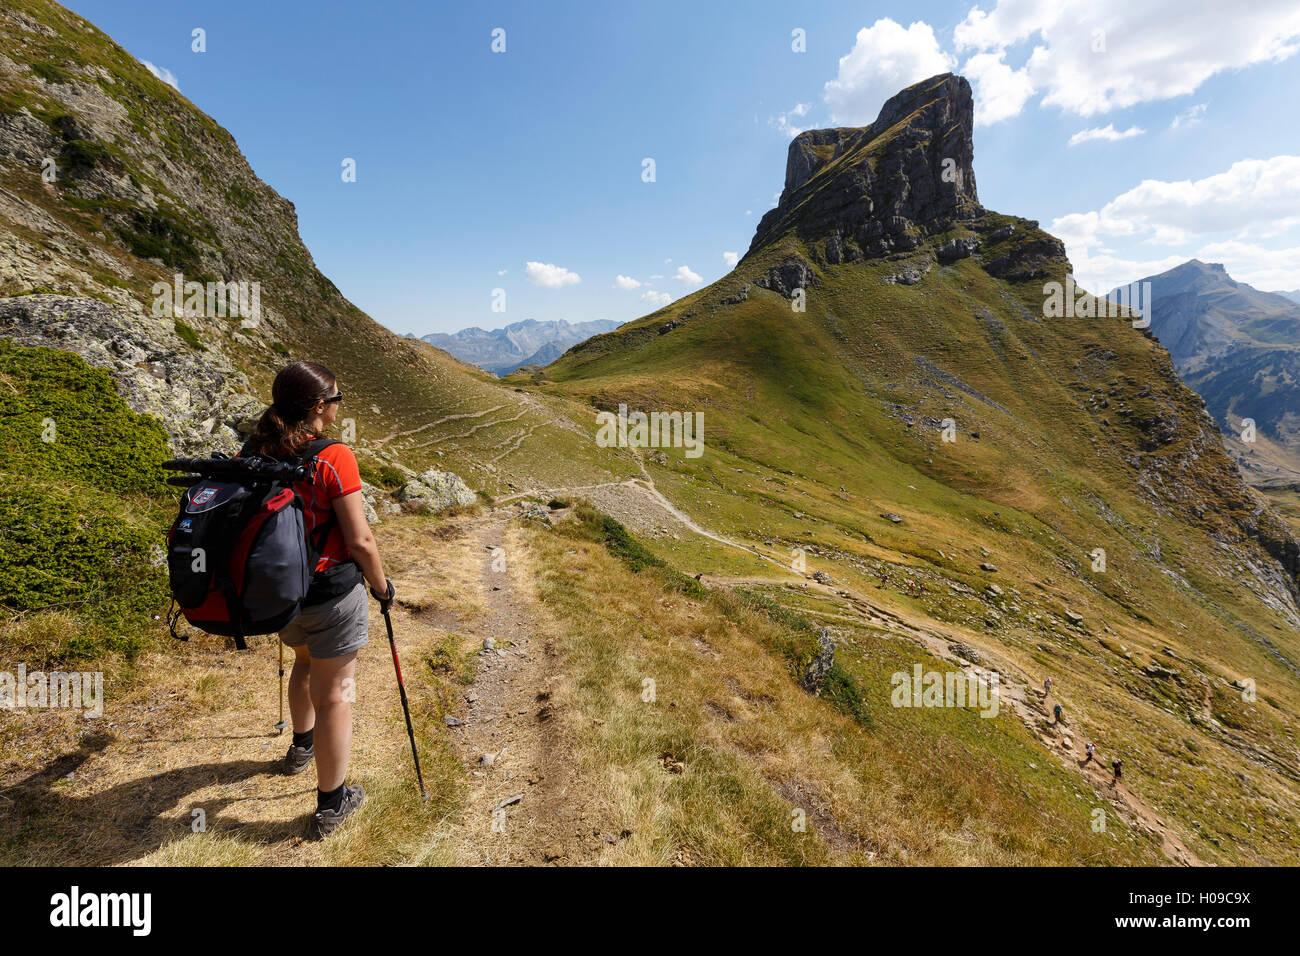 Randonnées, lacs Ayous femmes itinéraire, Pyrénées, France, Europe Photo Stock